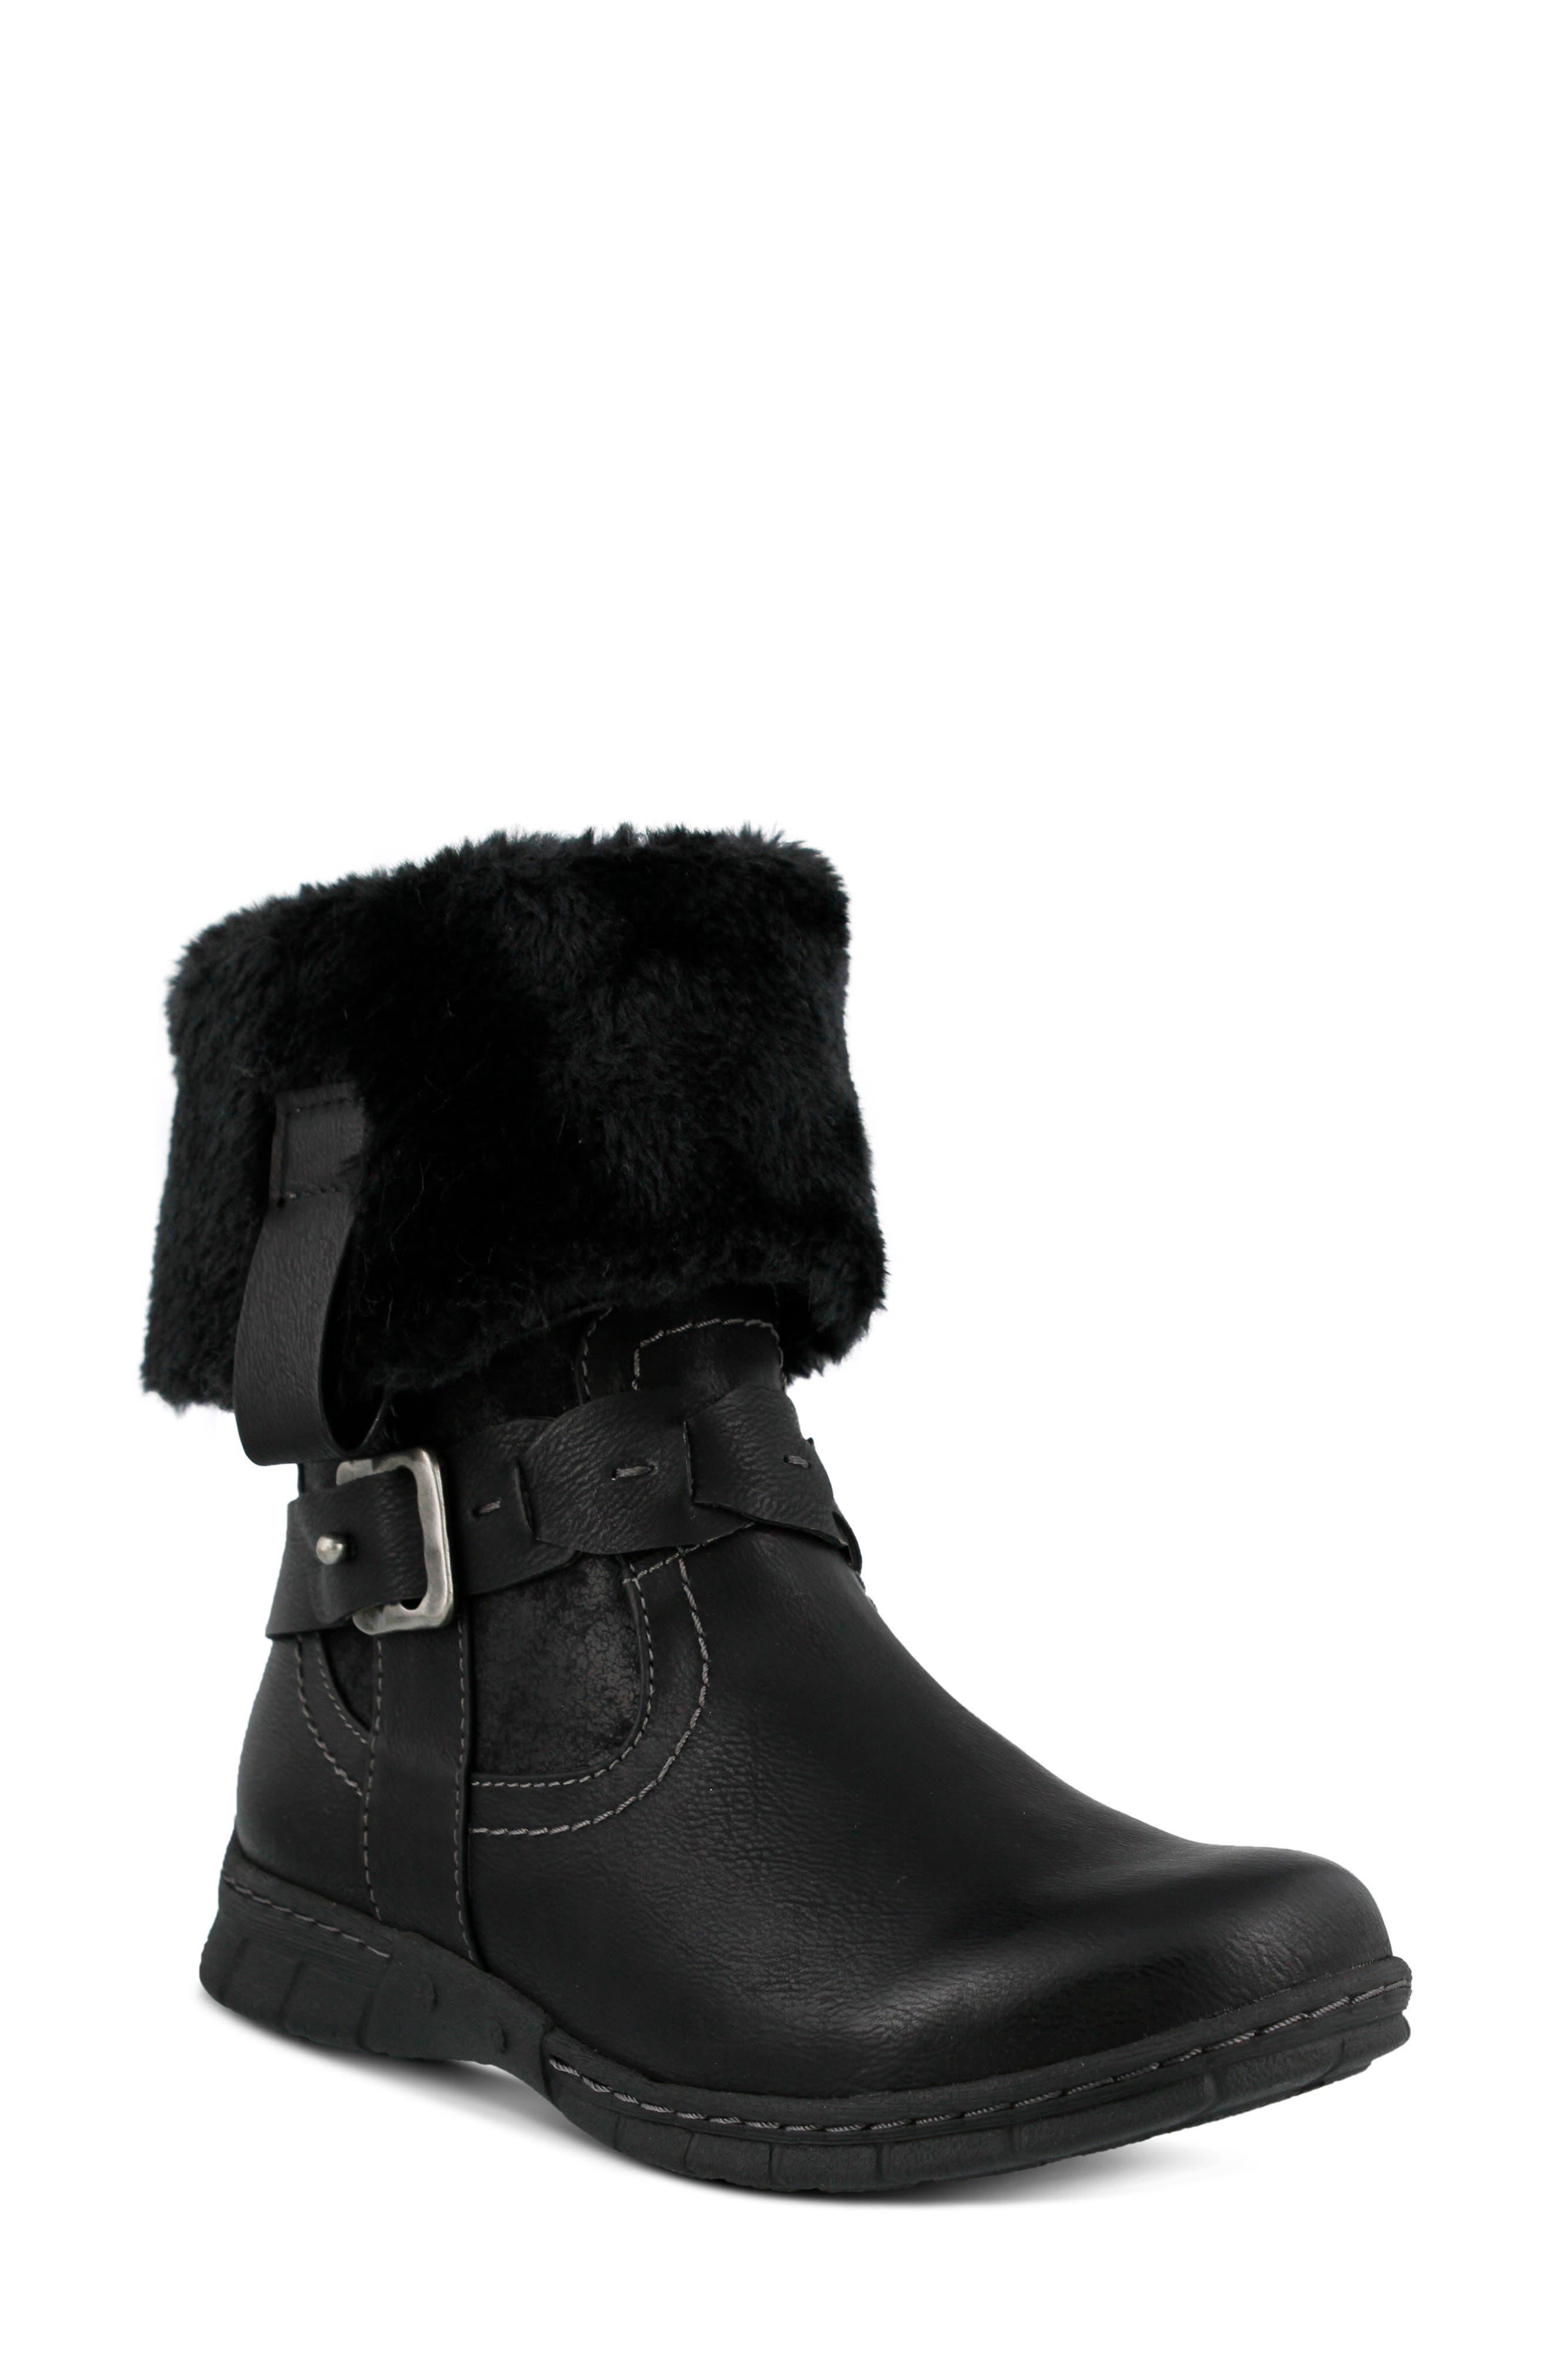 Spring Step Peeta Water Resistant Faux Fur Boot - Black